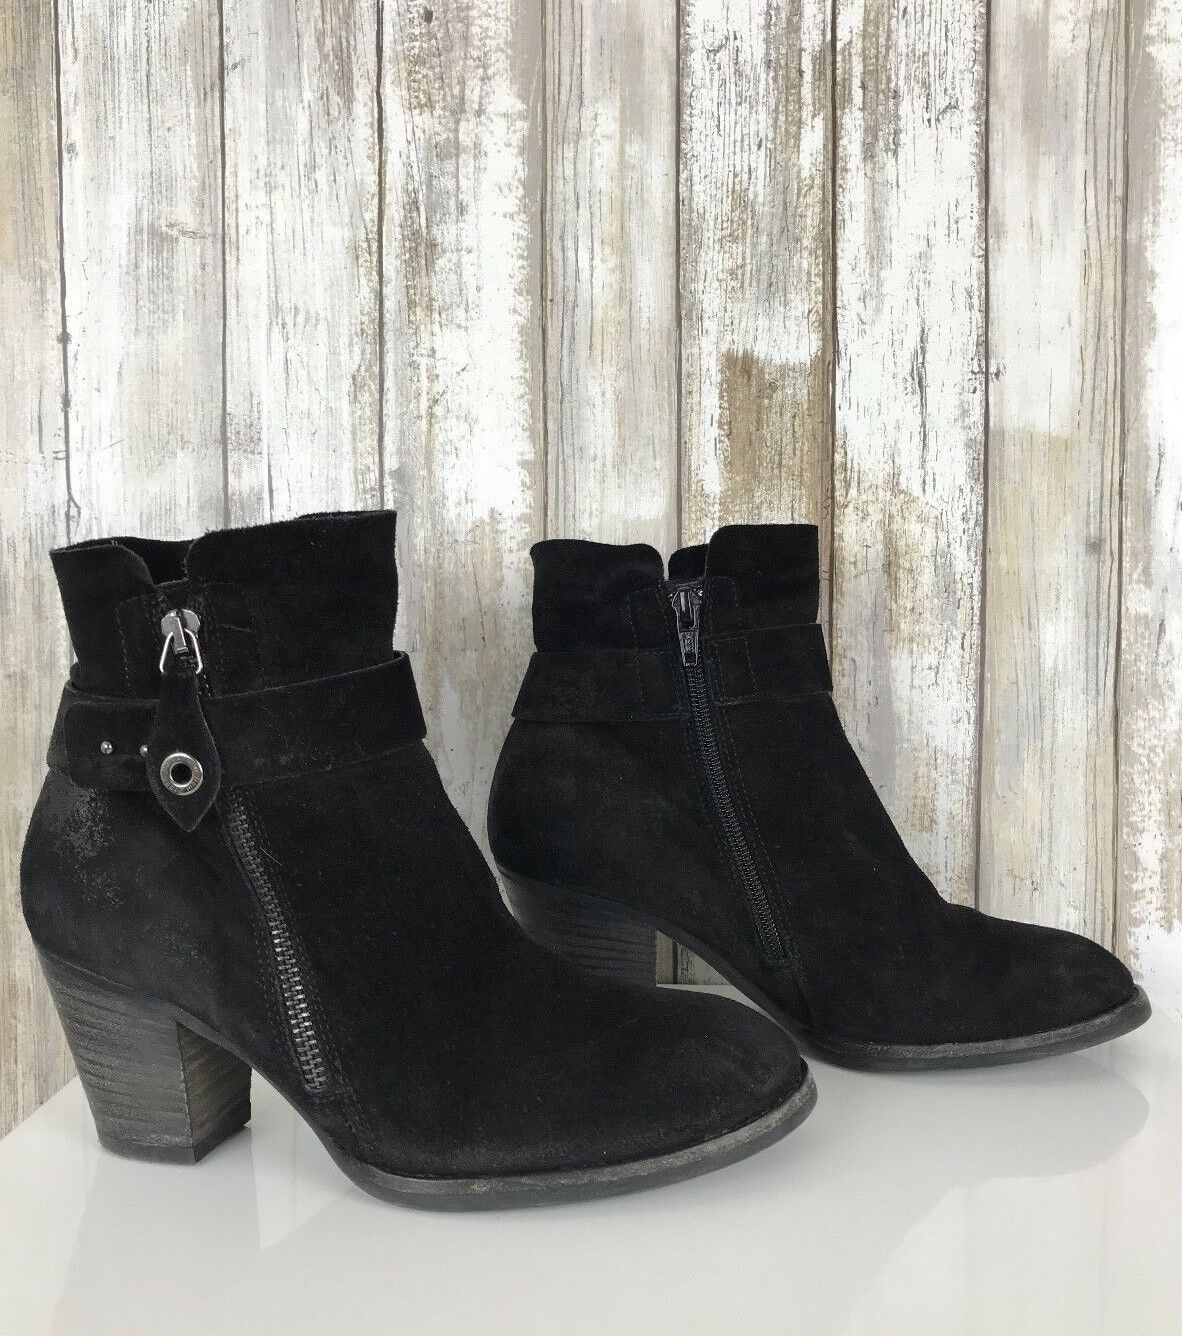 in vendita  375 PAUL verde Dallas nero Distressed Suede Suede Suede Ankle avvioie Heel Zipper US 6  wholesape economico